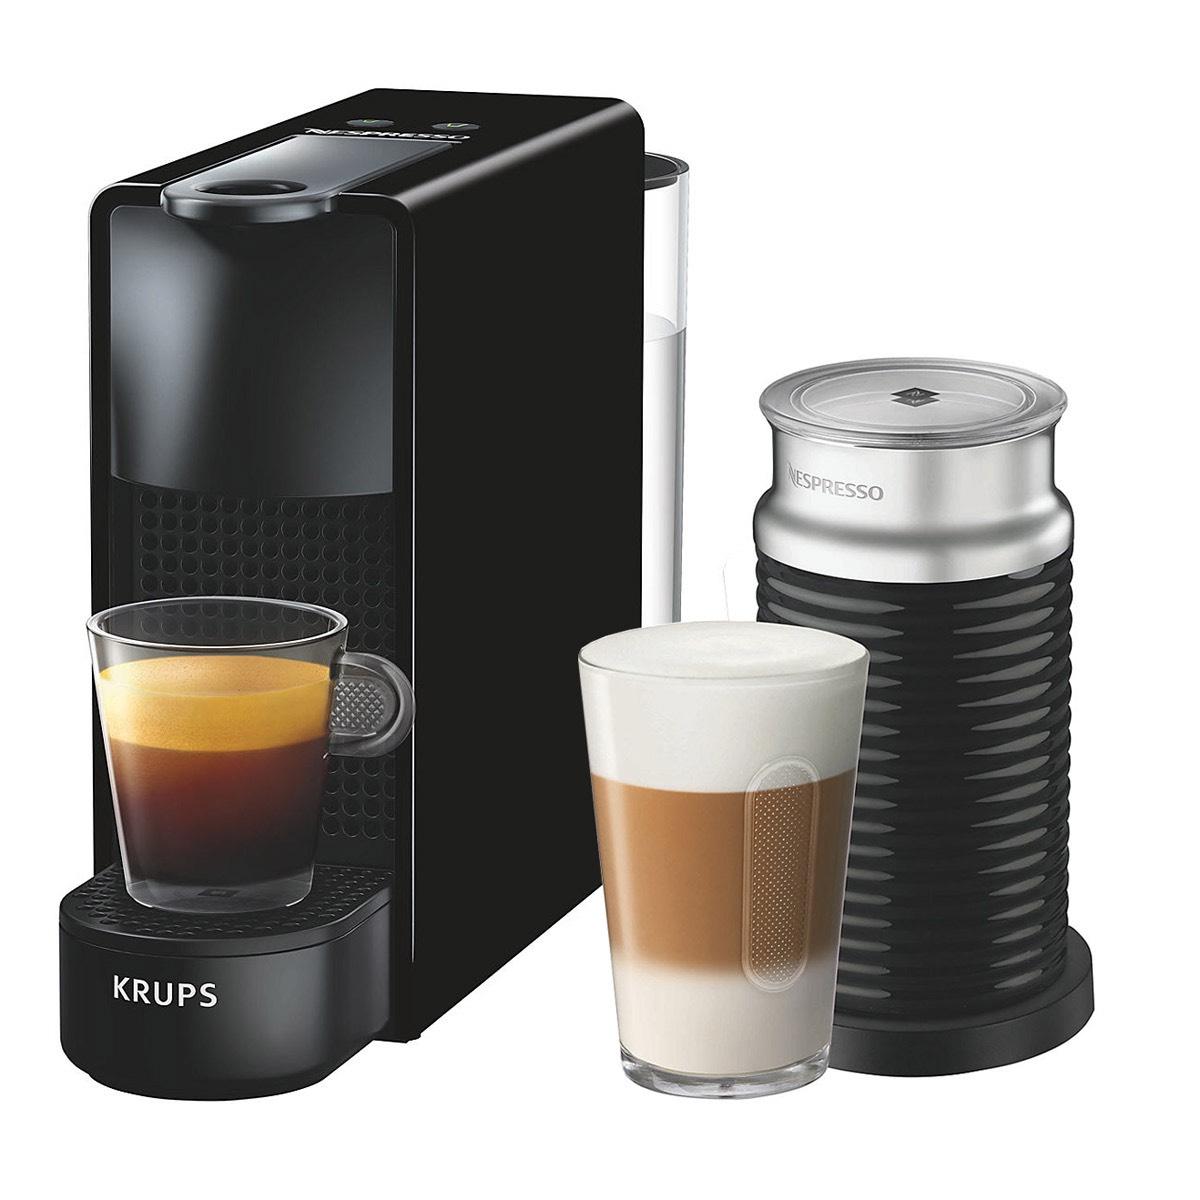 Nespresso Essenza Mini Coffee Machine with Aeroccino by KRUPS, Black - £82.99 @ John Lewis